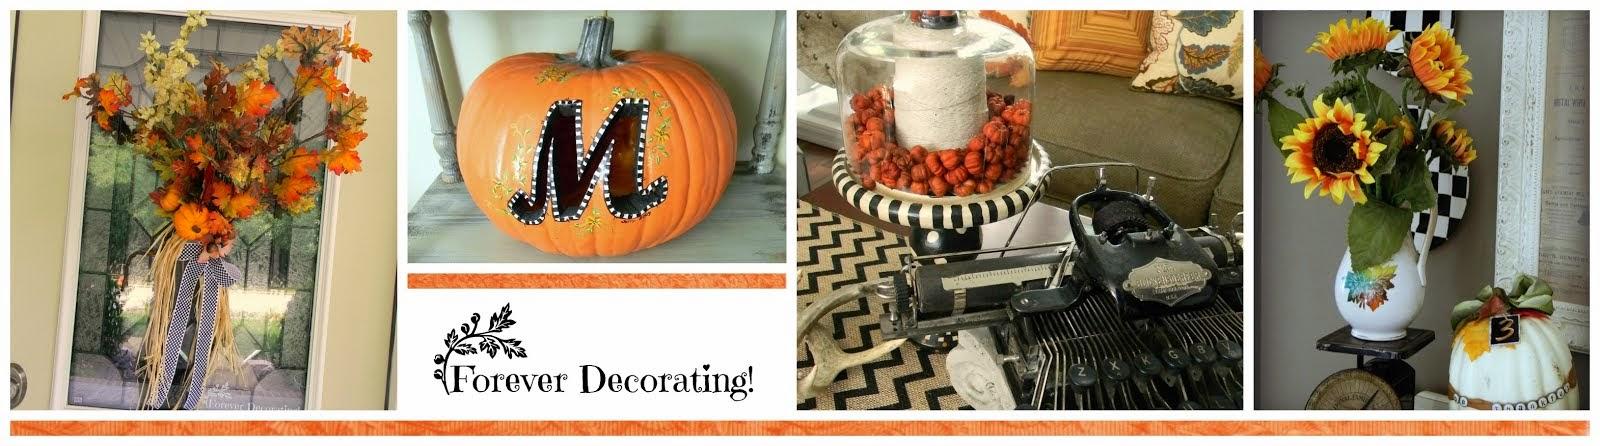 Forever Decorating!